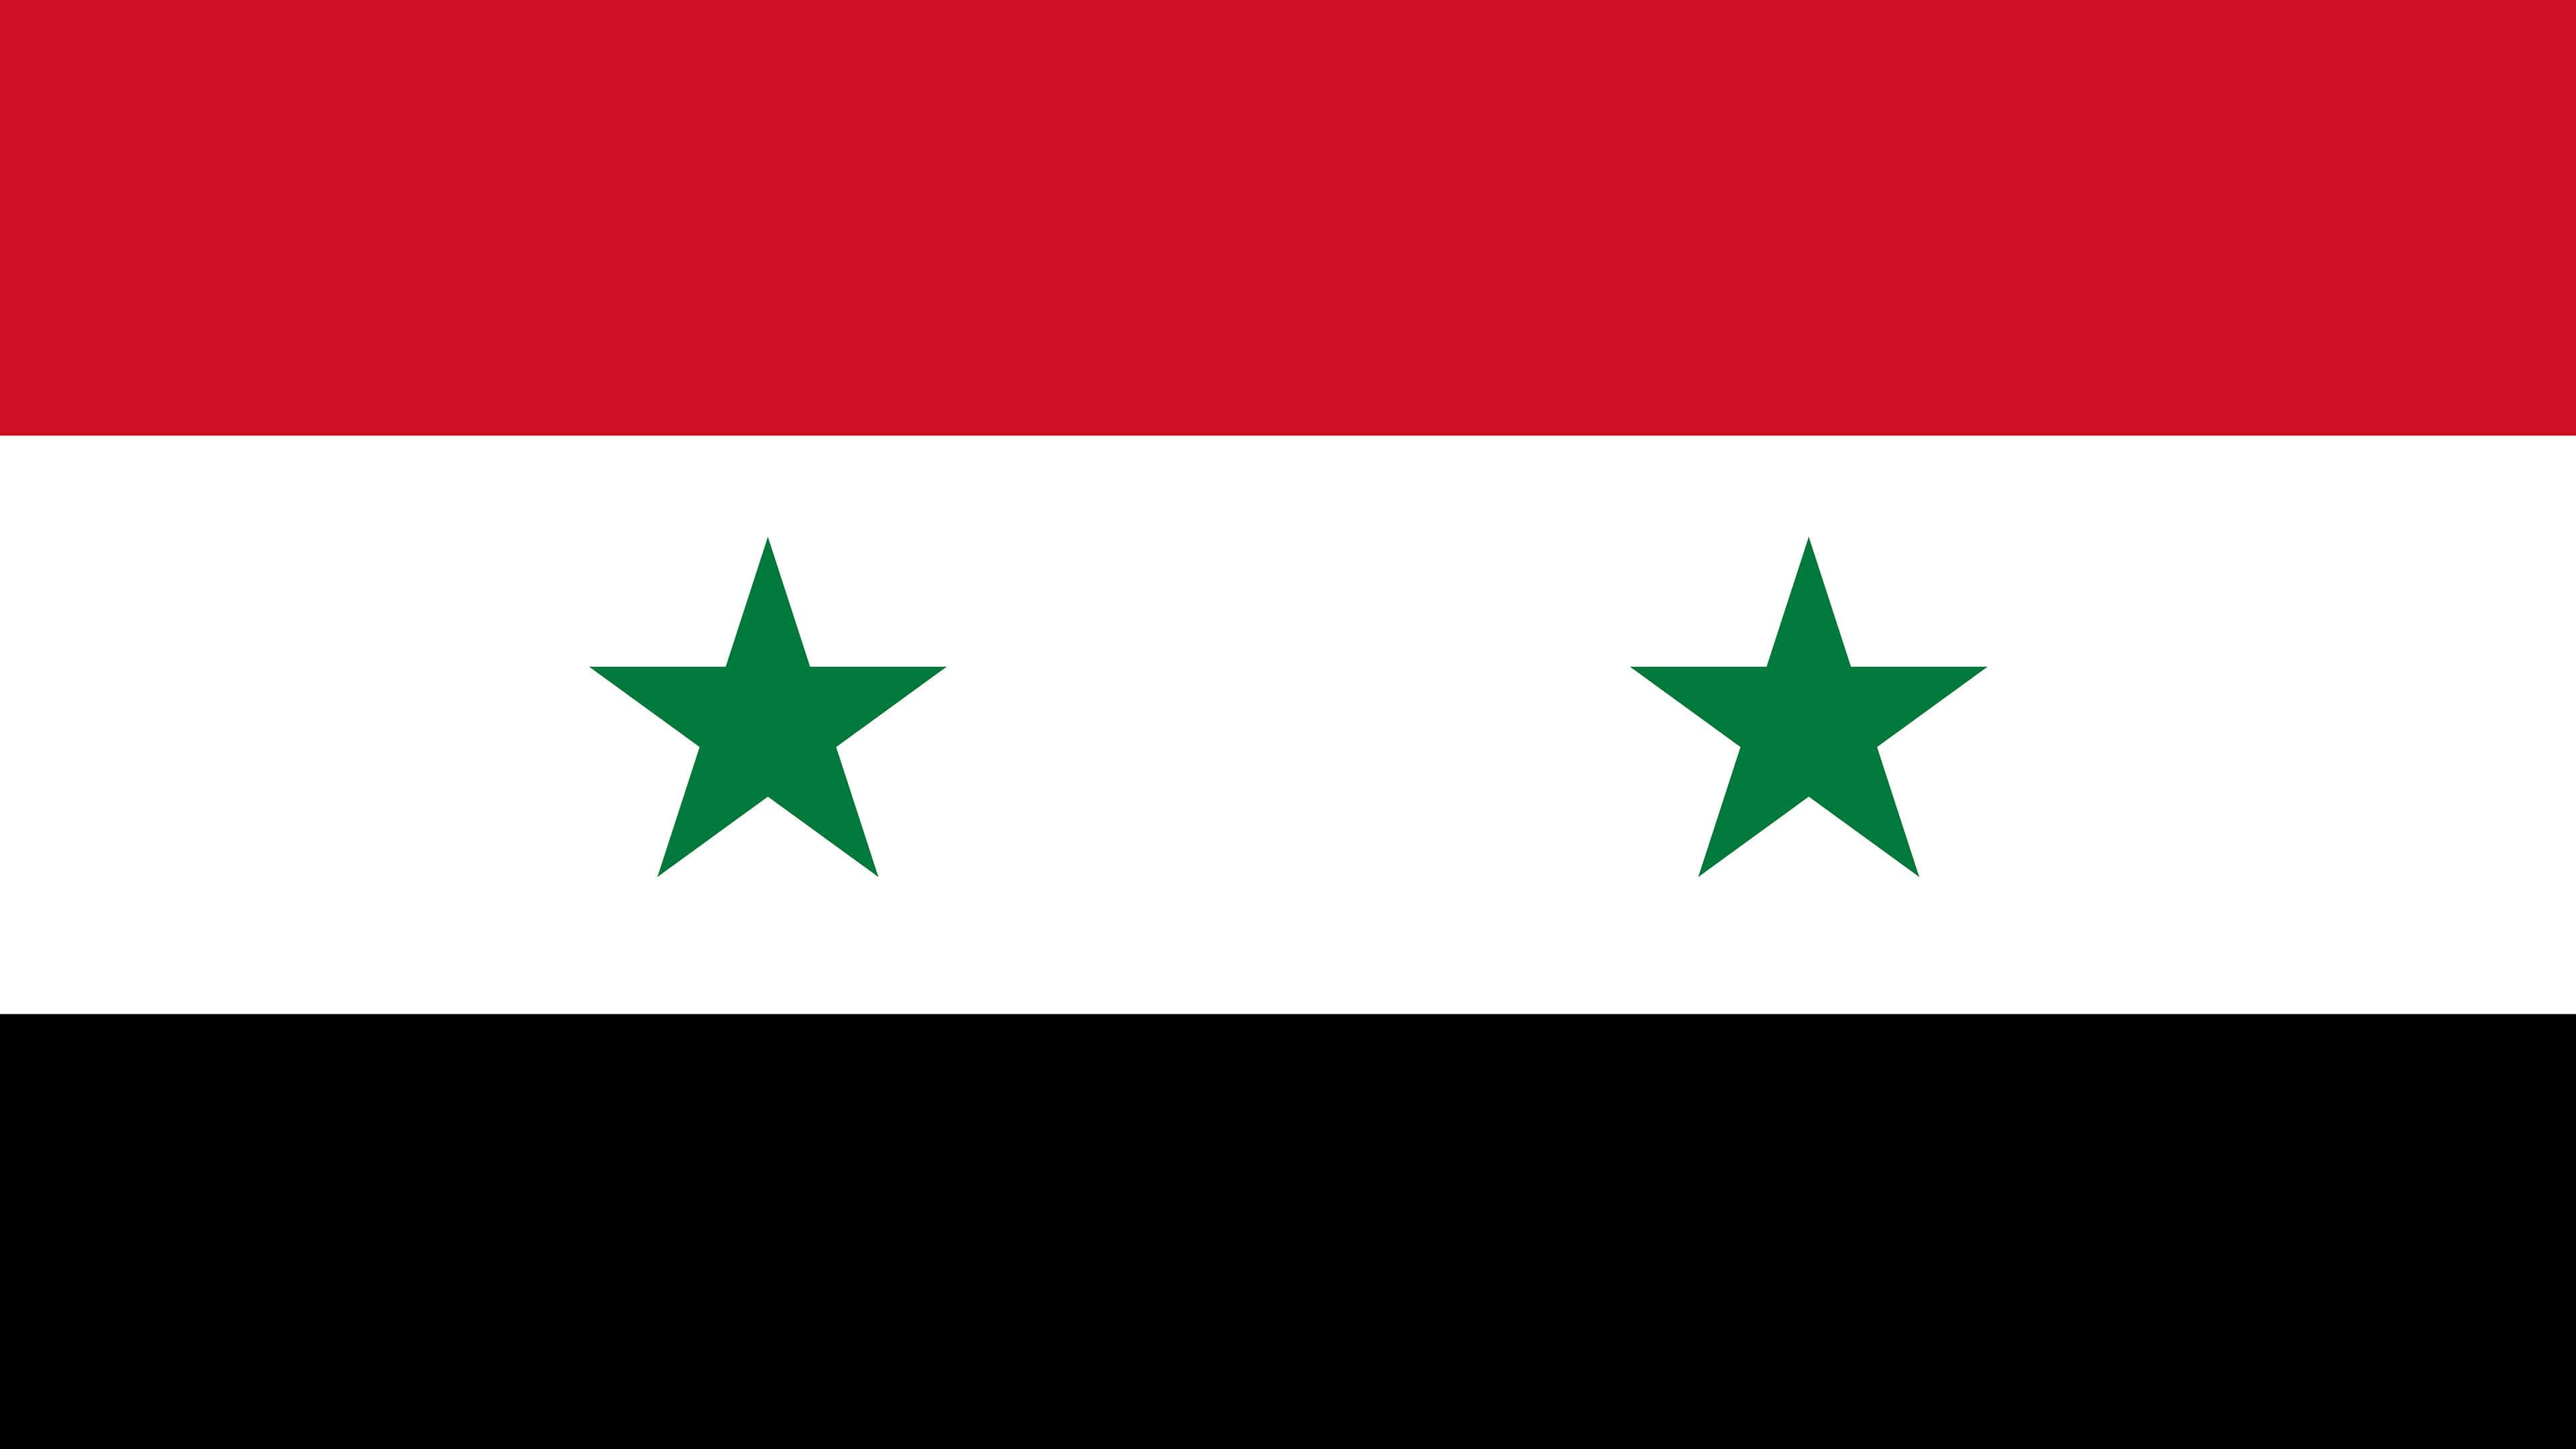 syria flag uhd 4k wallpaper